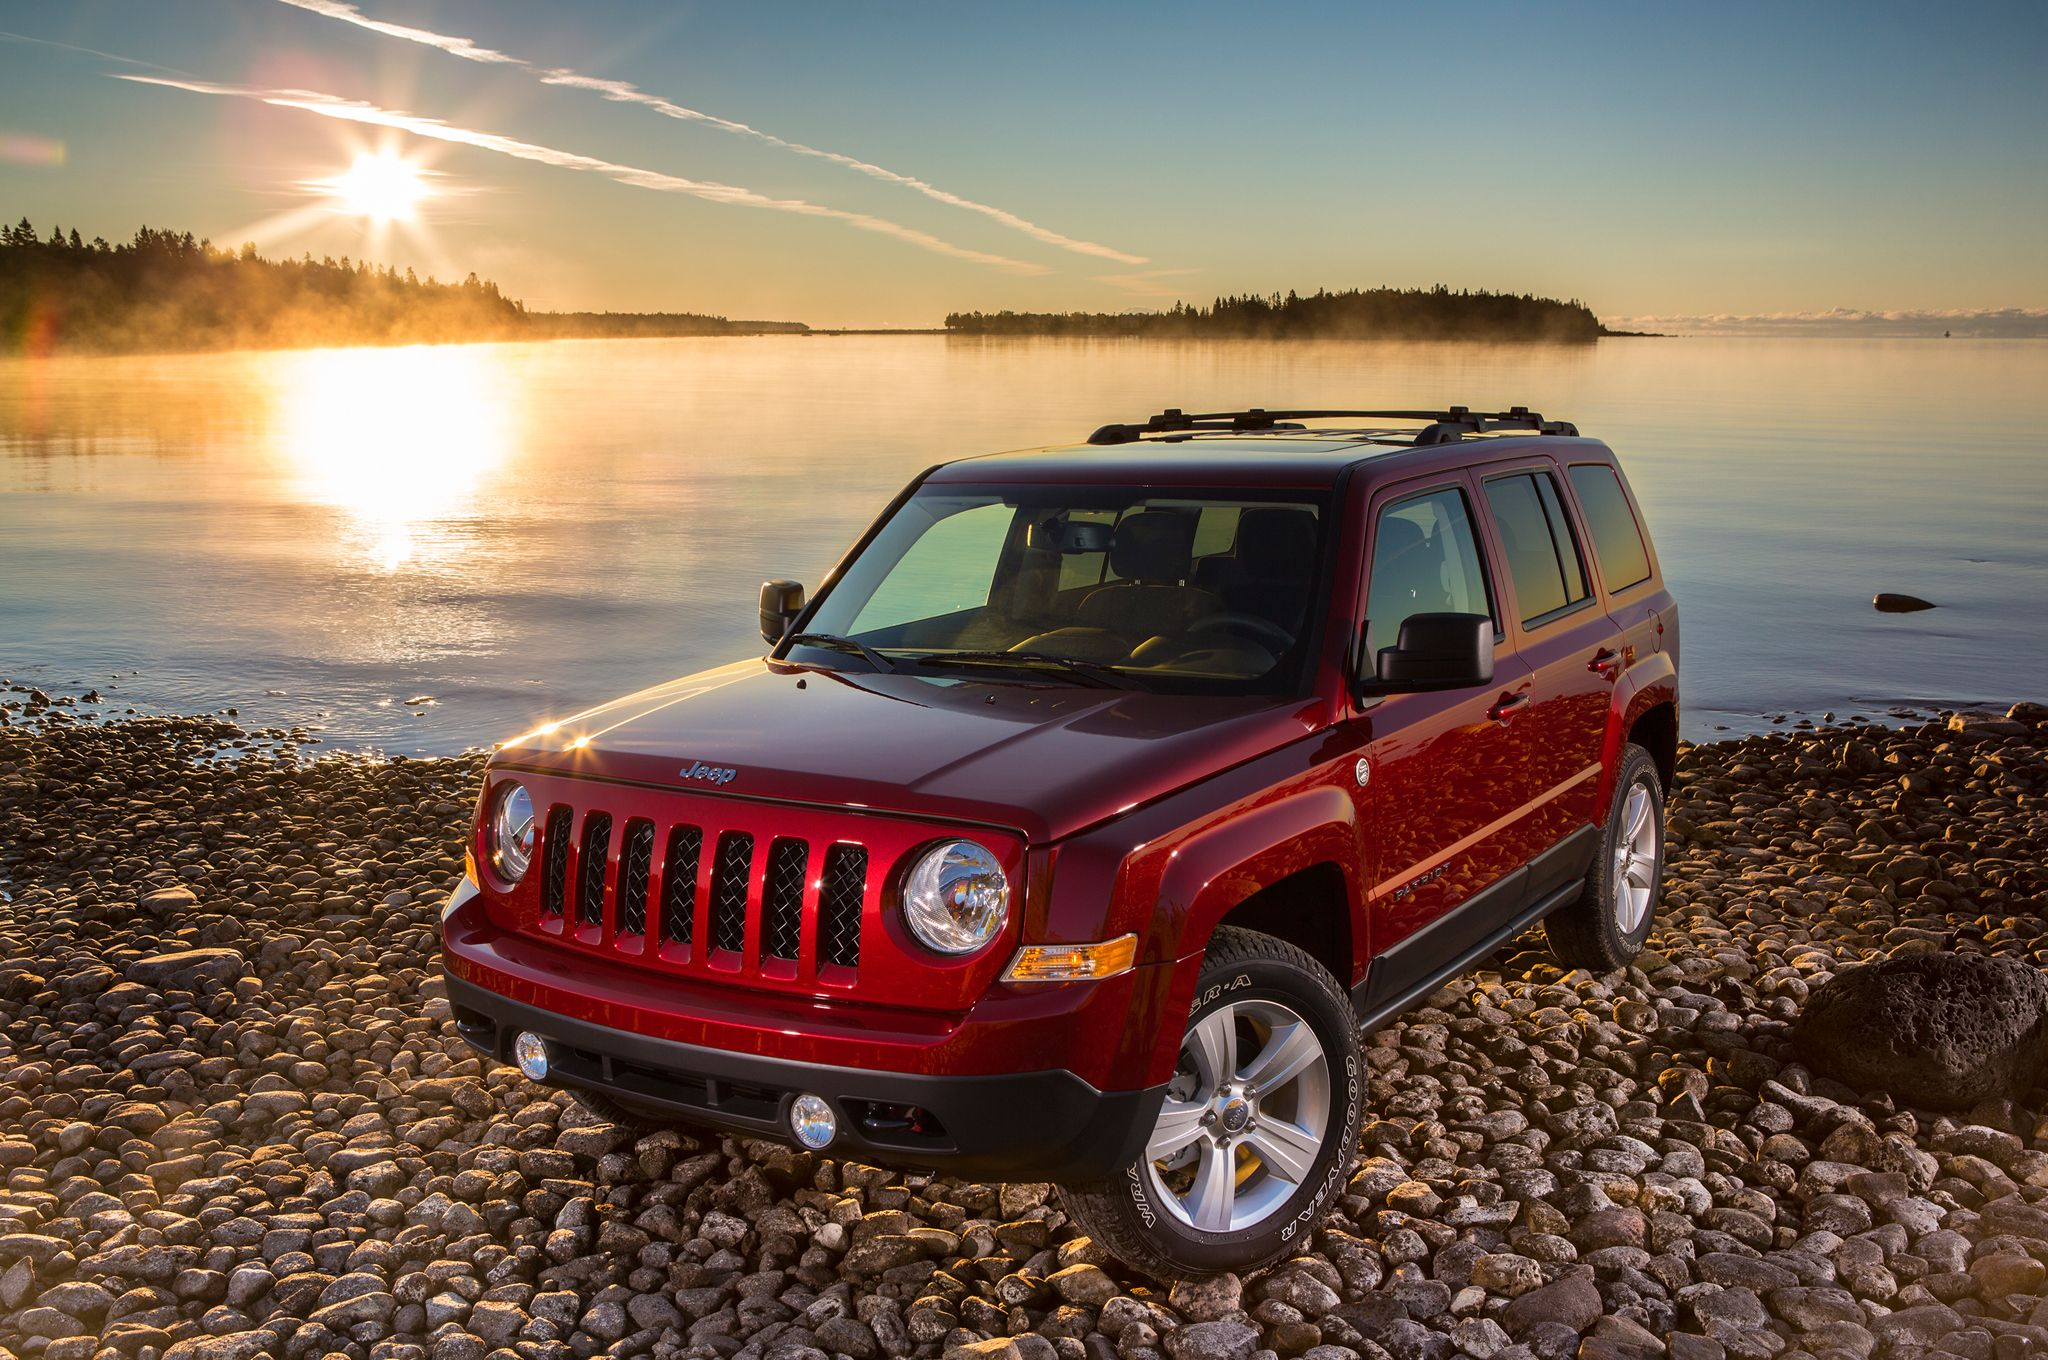 Least Practical Suvs Jeep Patriot 2014 Jeep Patriot Best New Cars